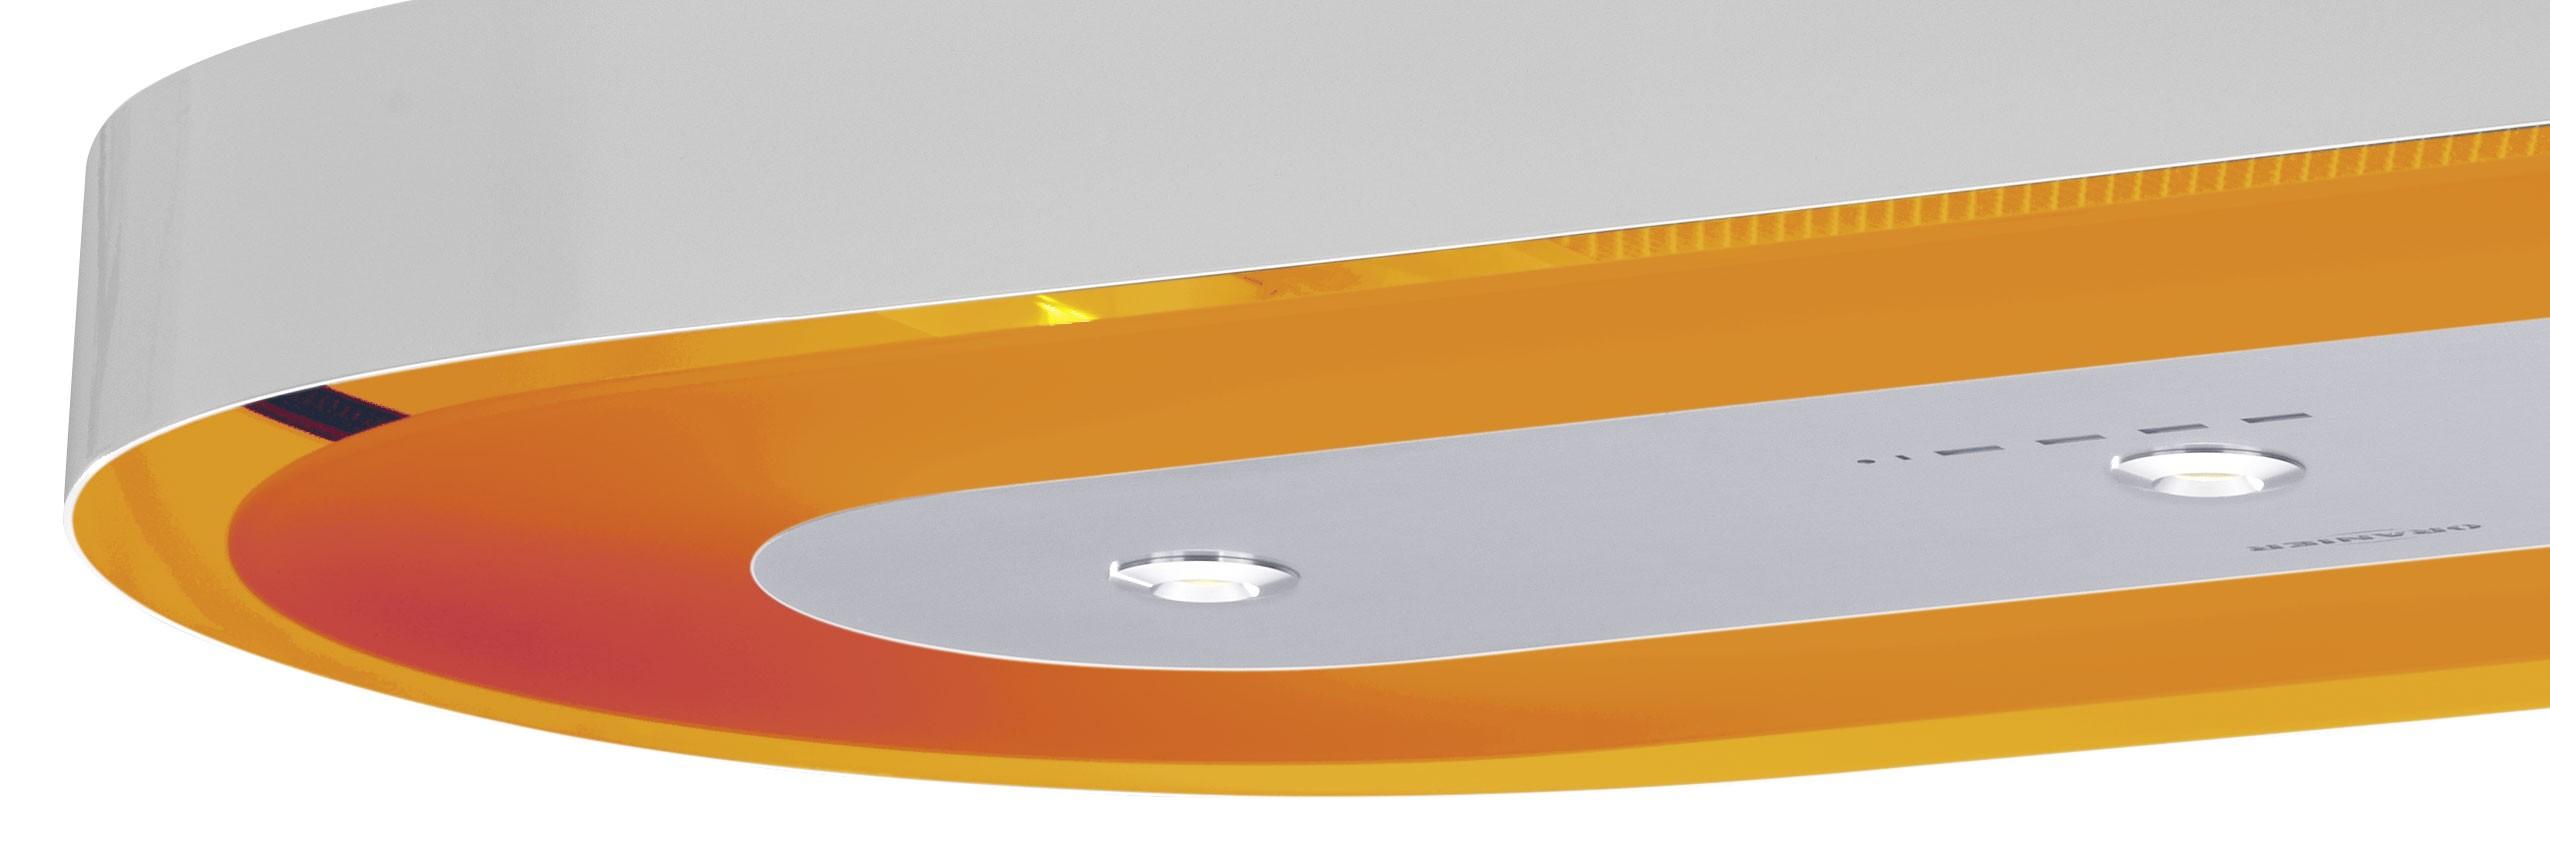 Oranier dunstabzugshauben deckenhaube santina w for Deckenhaube